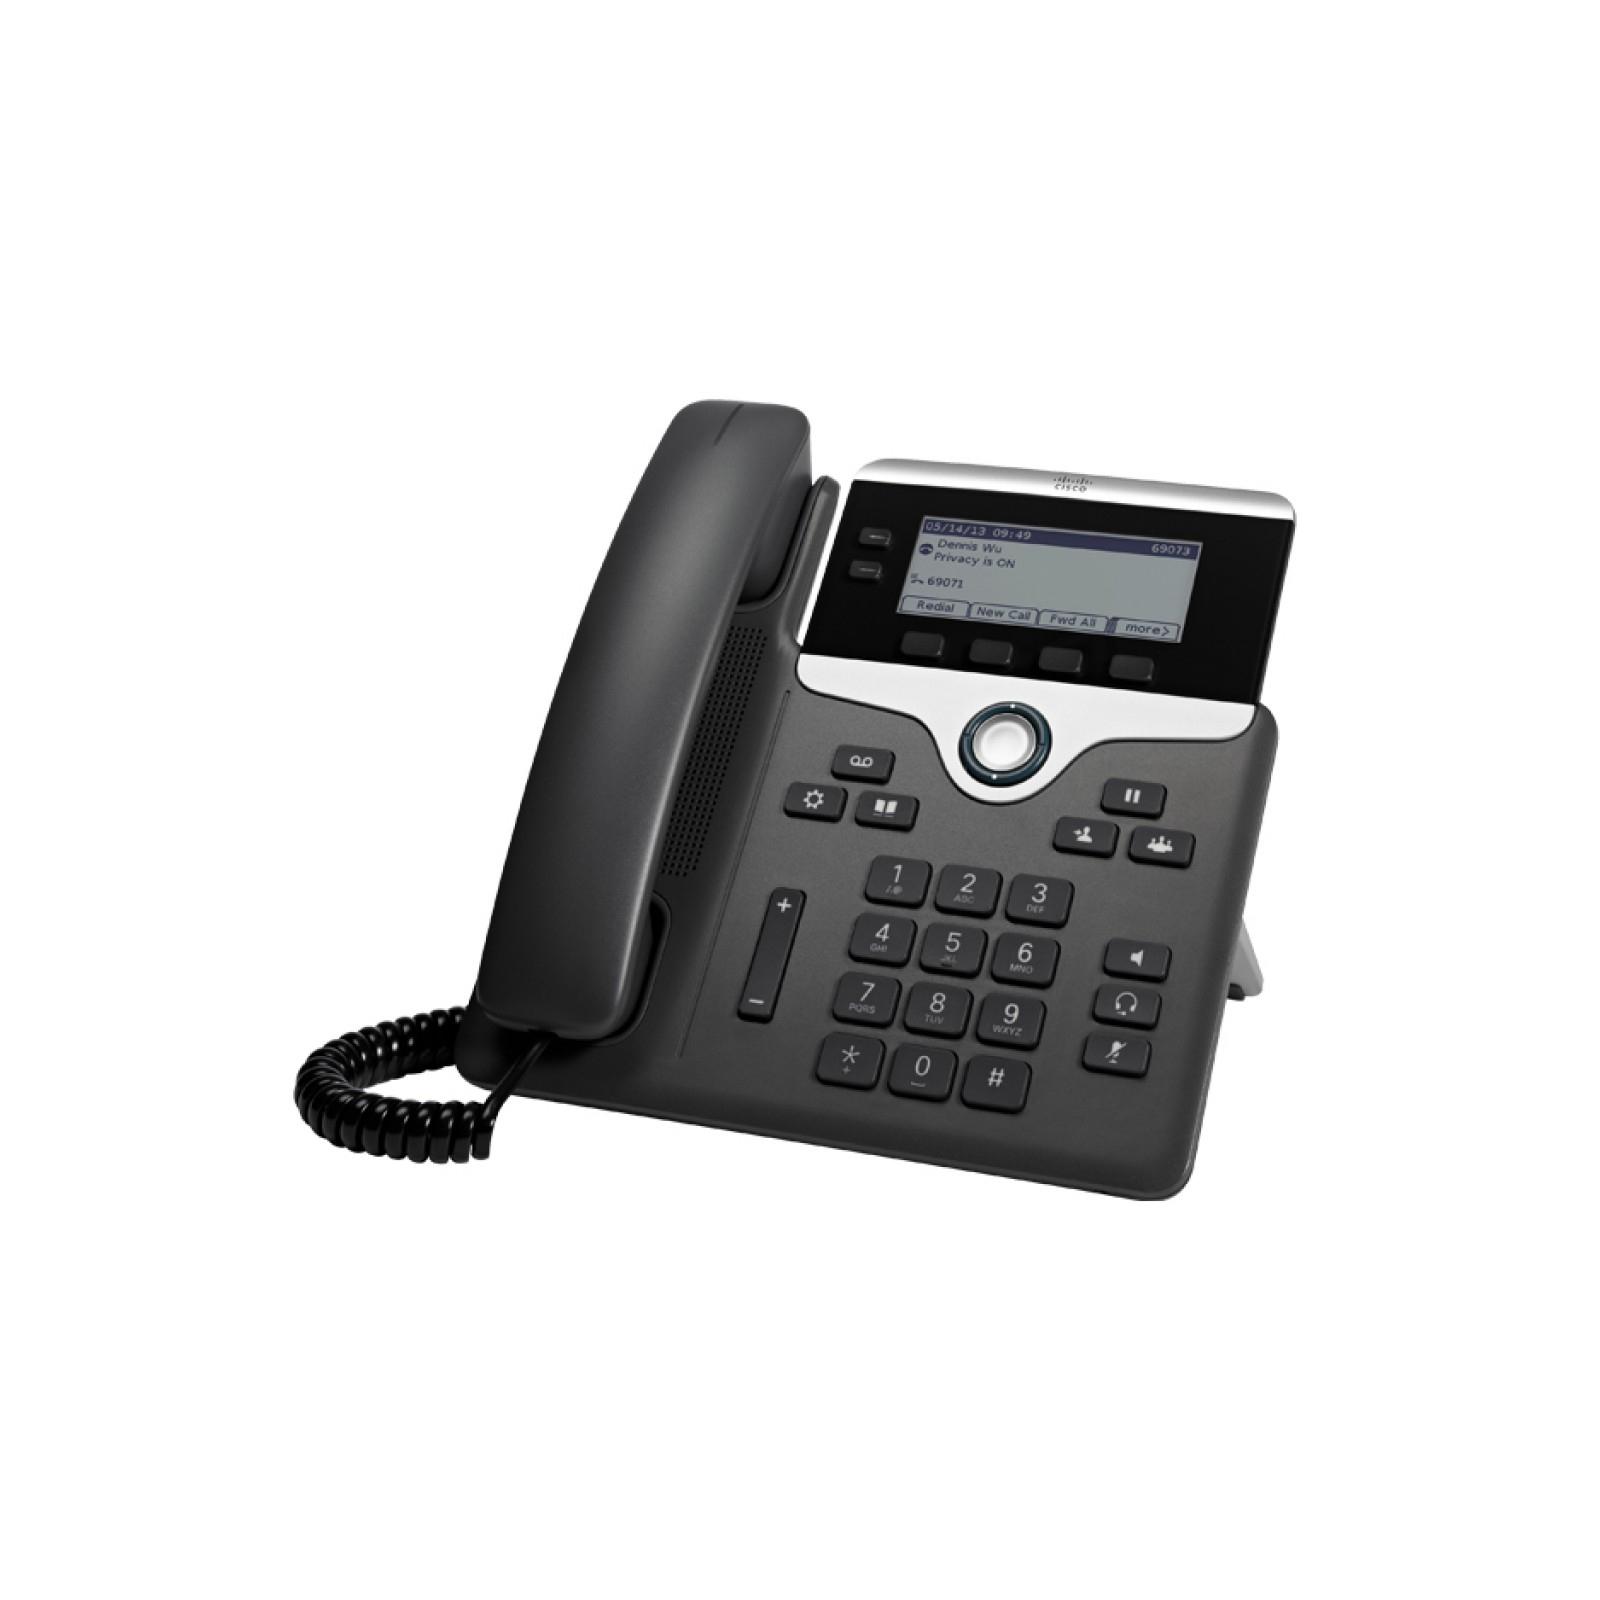 IP телефон Cisco SNTC-8X5XNBD (con-snt-cp7821k9)